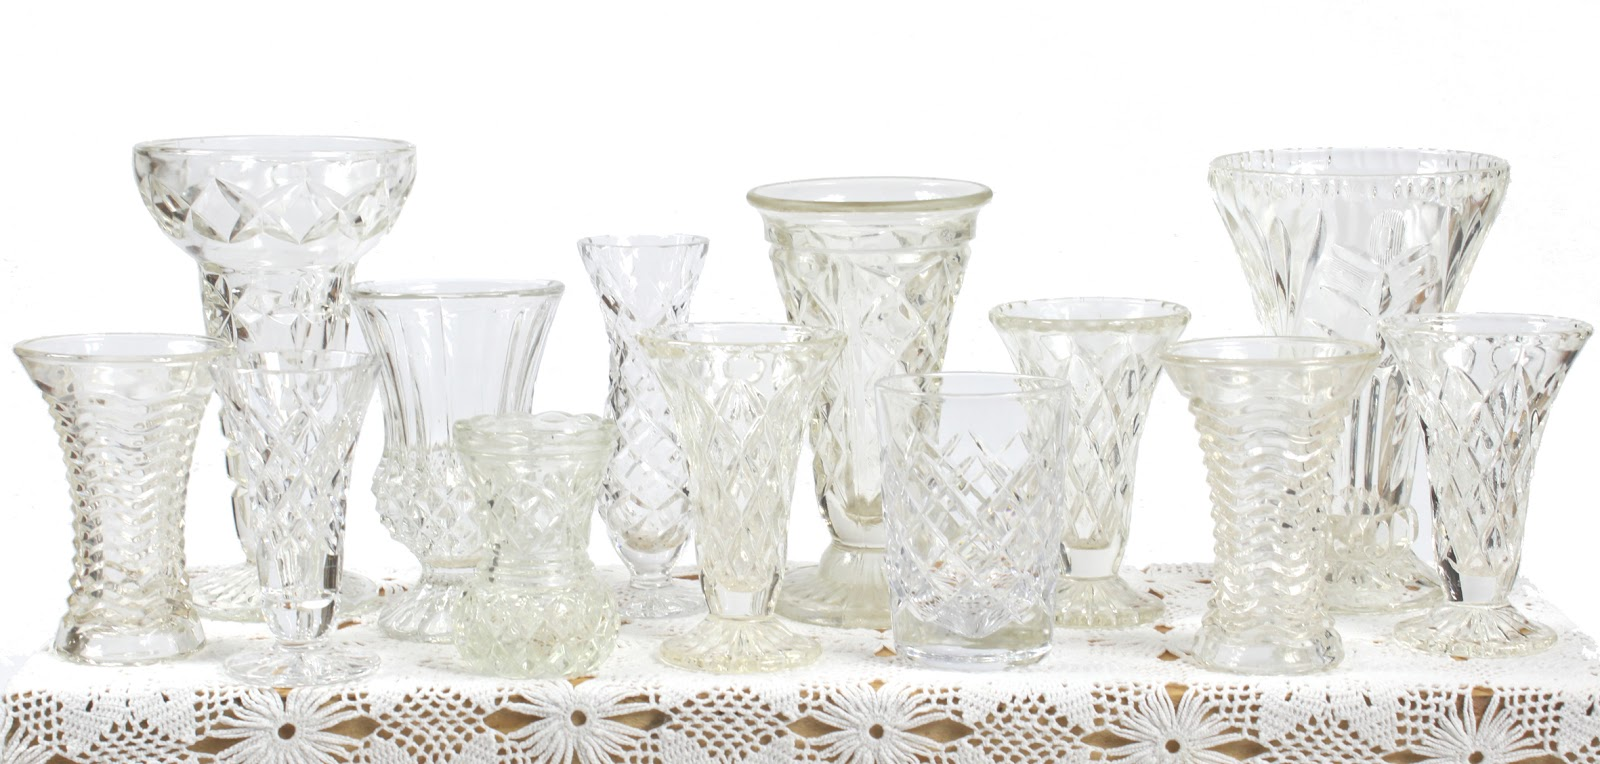 Little vintage days vases bottles and jars vintage cut glass and crystal vases small medium reviewsmspy